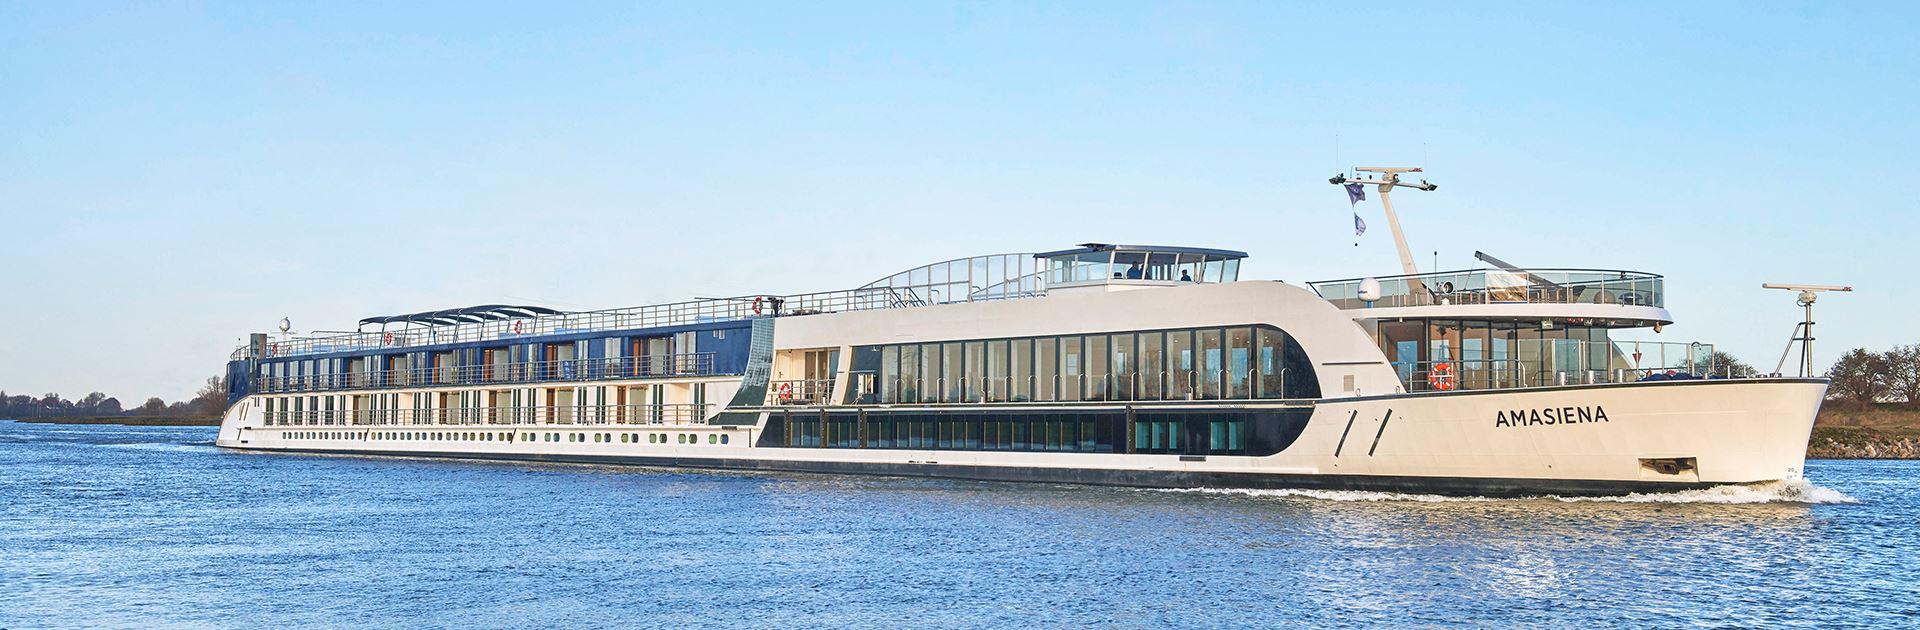 River Cruises Amawaterways River Cruise Line